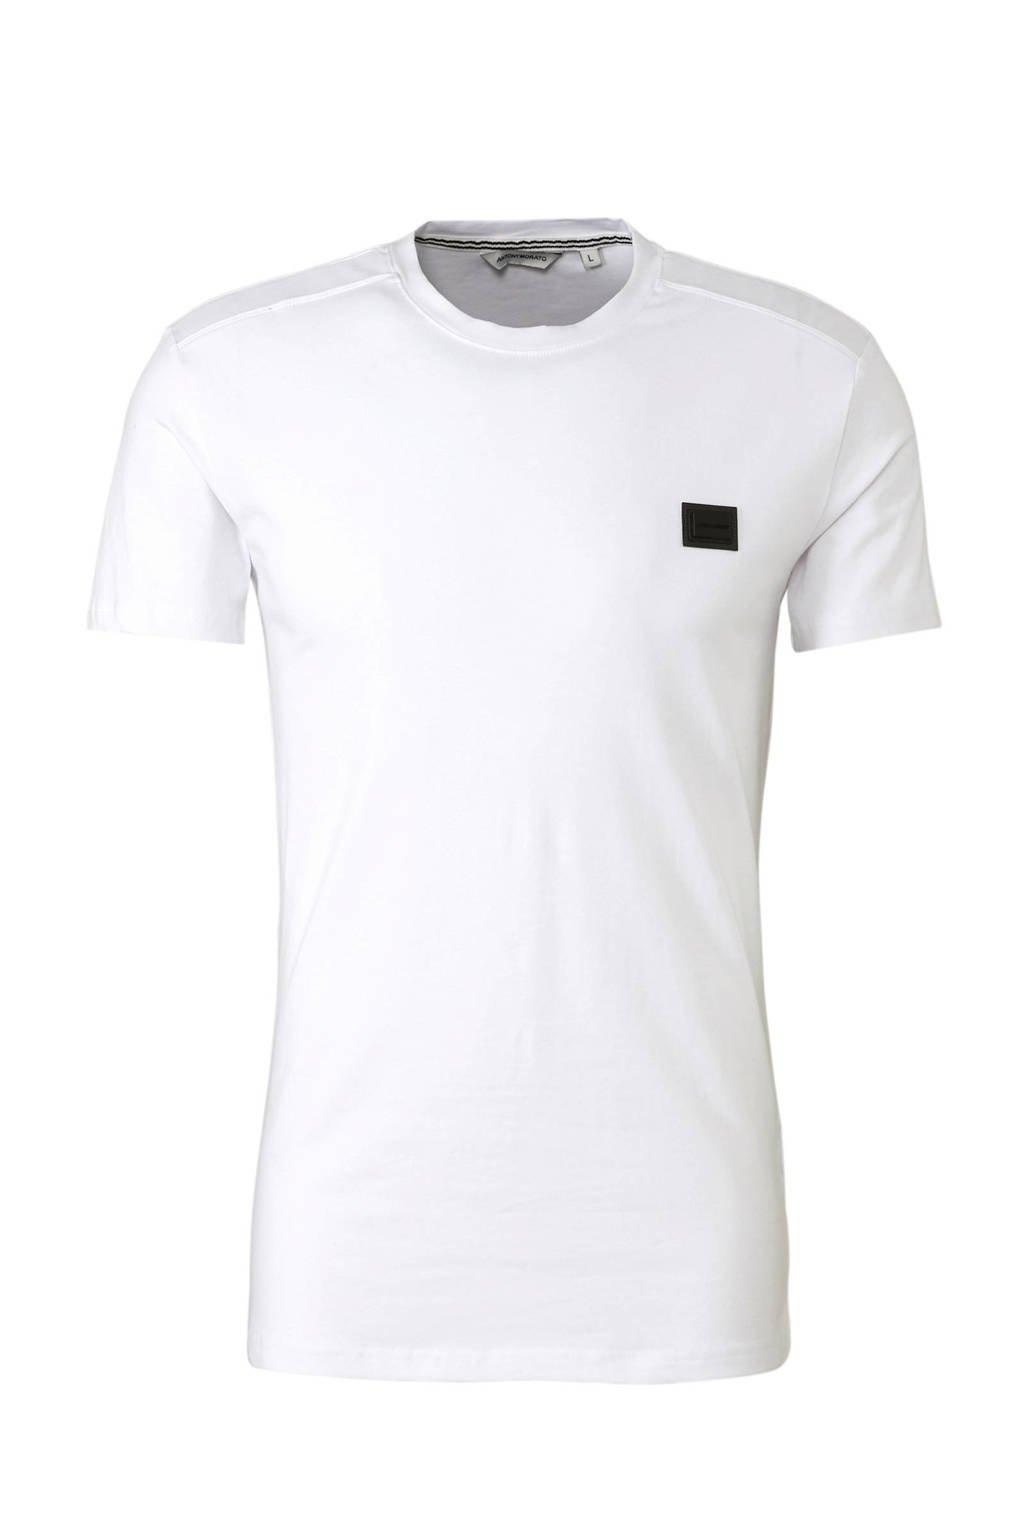 Antony Morato T-shirt met logo wit, Wit